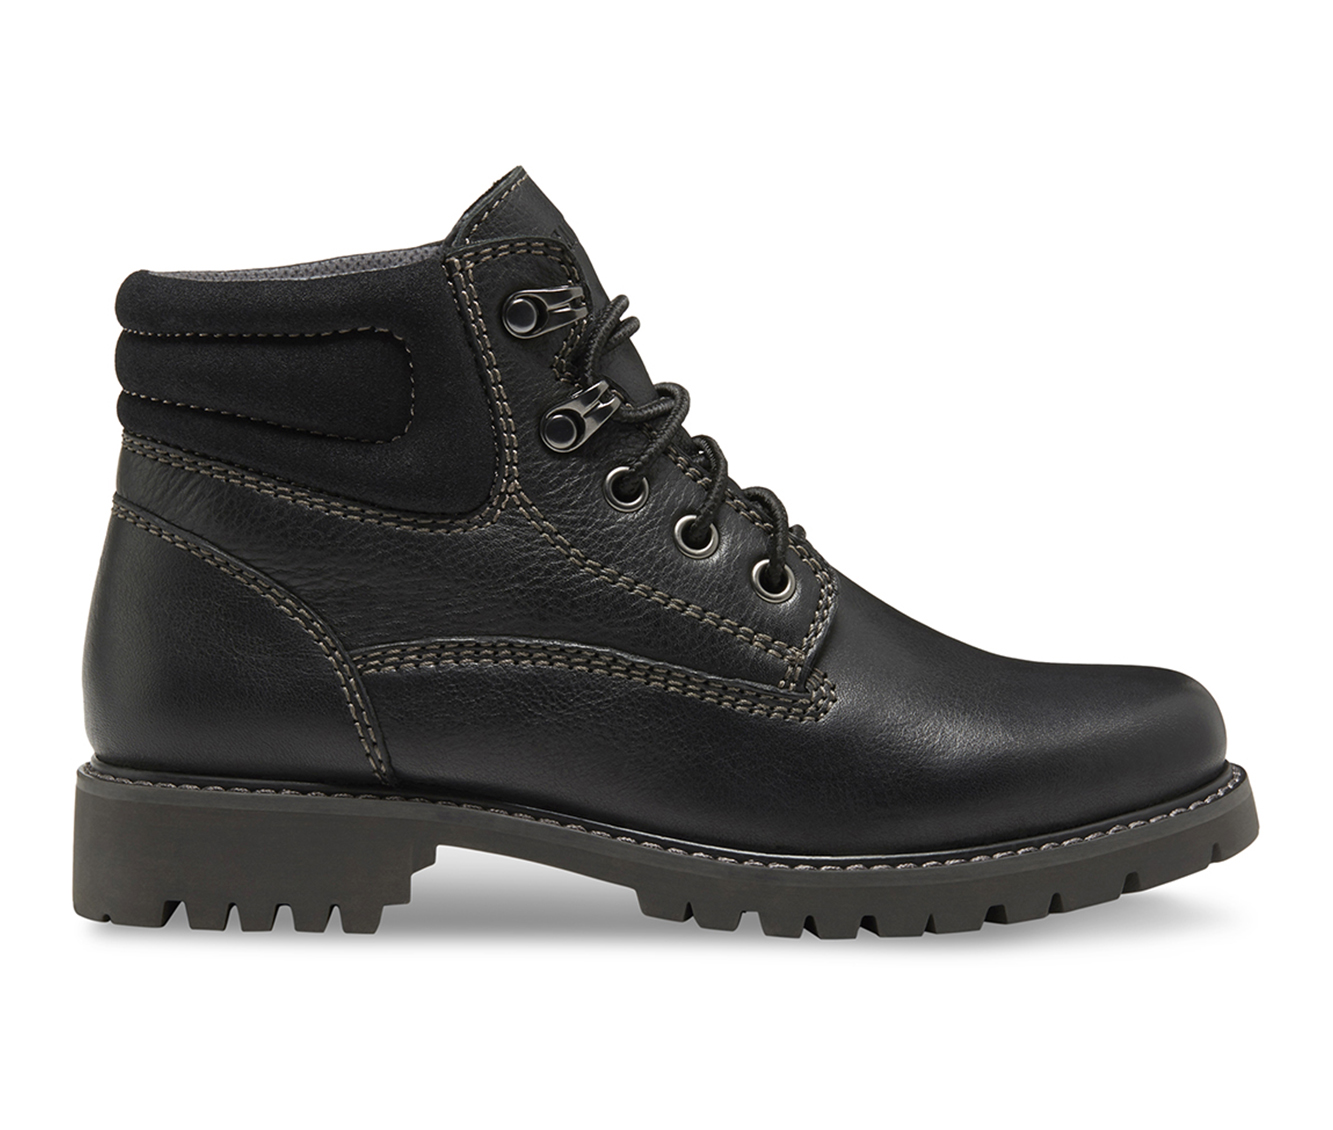 Eastland Edith Women's Boots (Black - Leather)